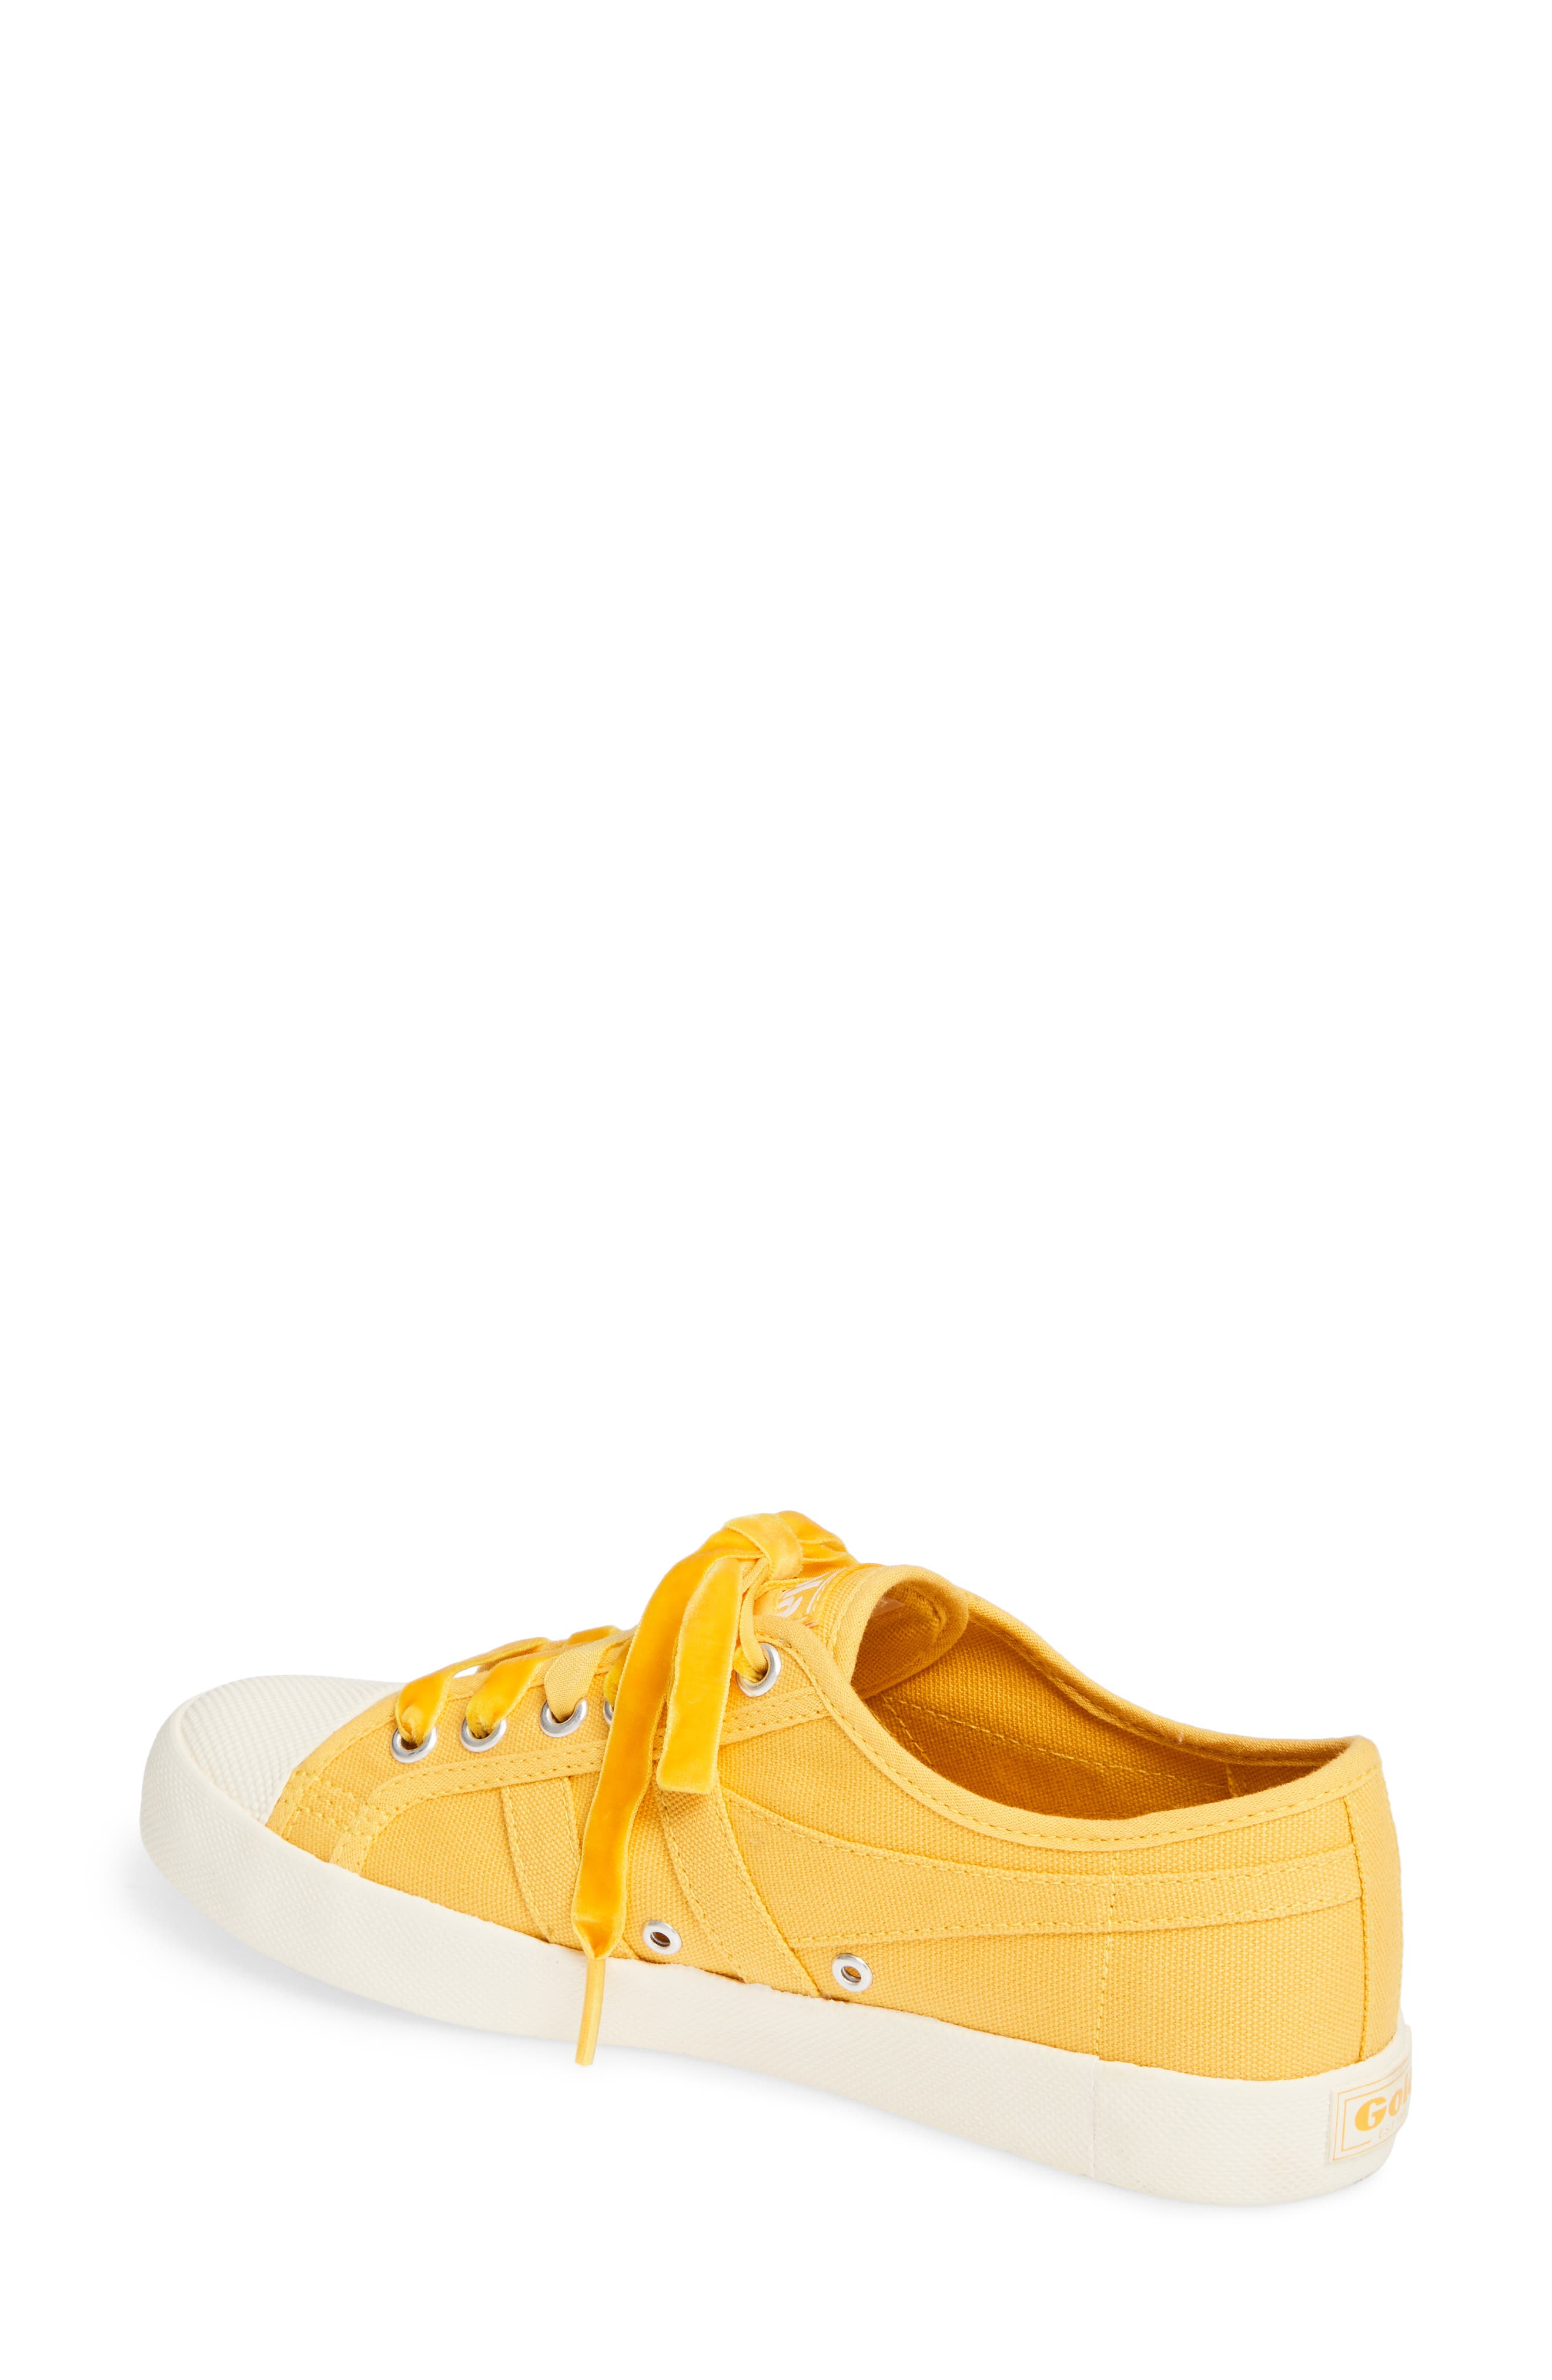 Coaster Sneaker,                             Alternate thumbnail 2, color,                             SUN/ OFF WHITE